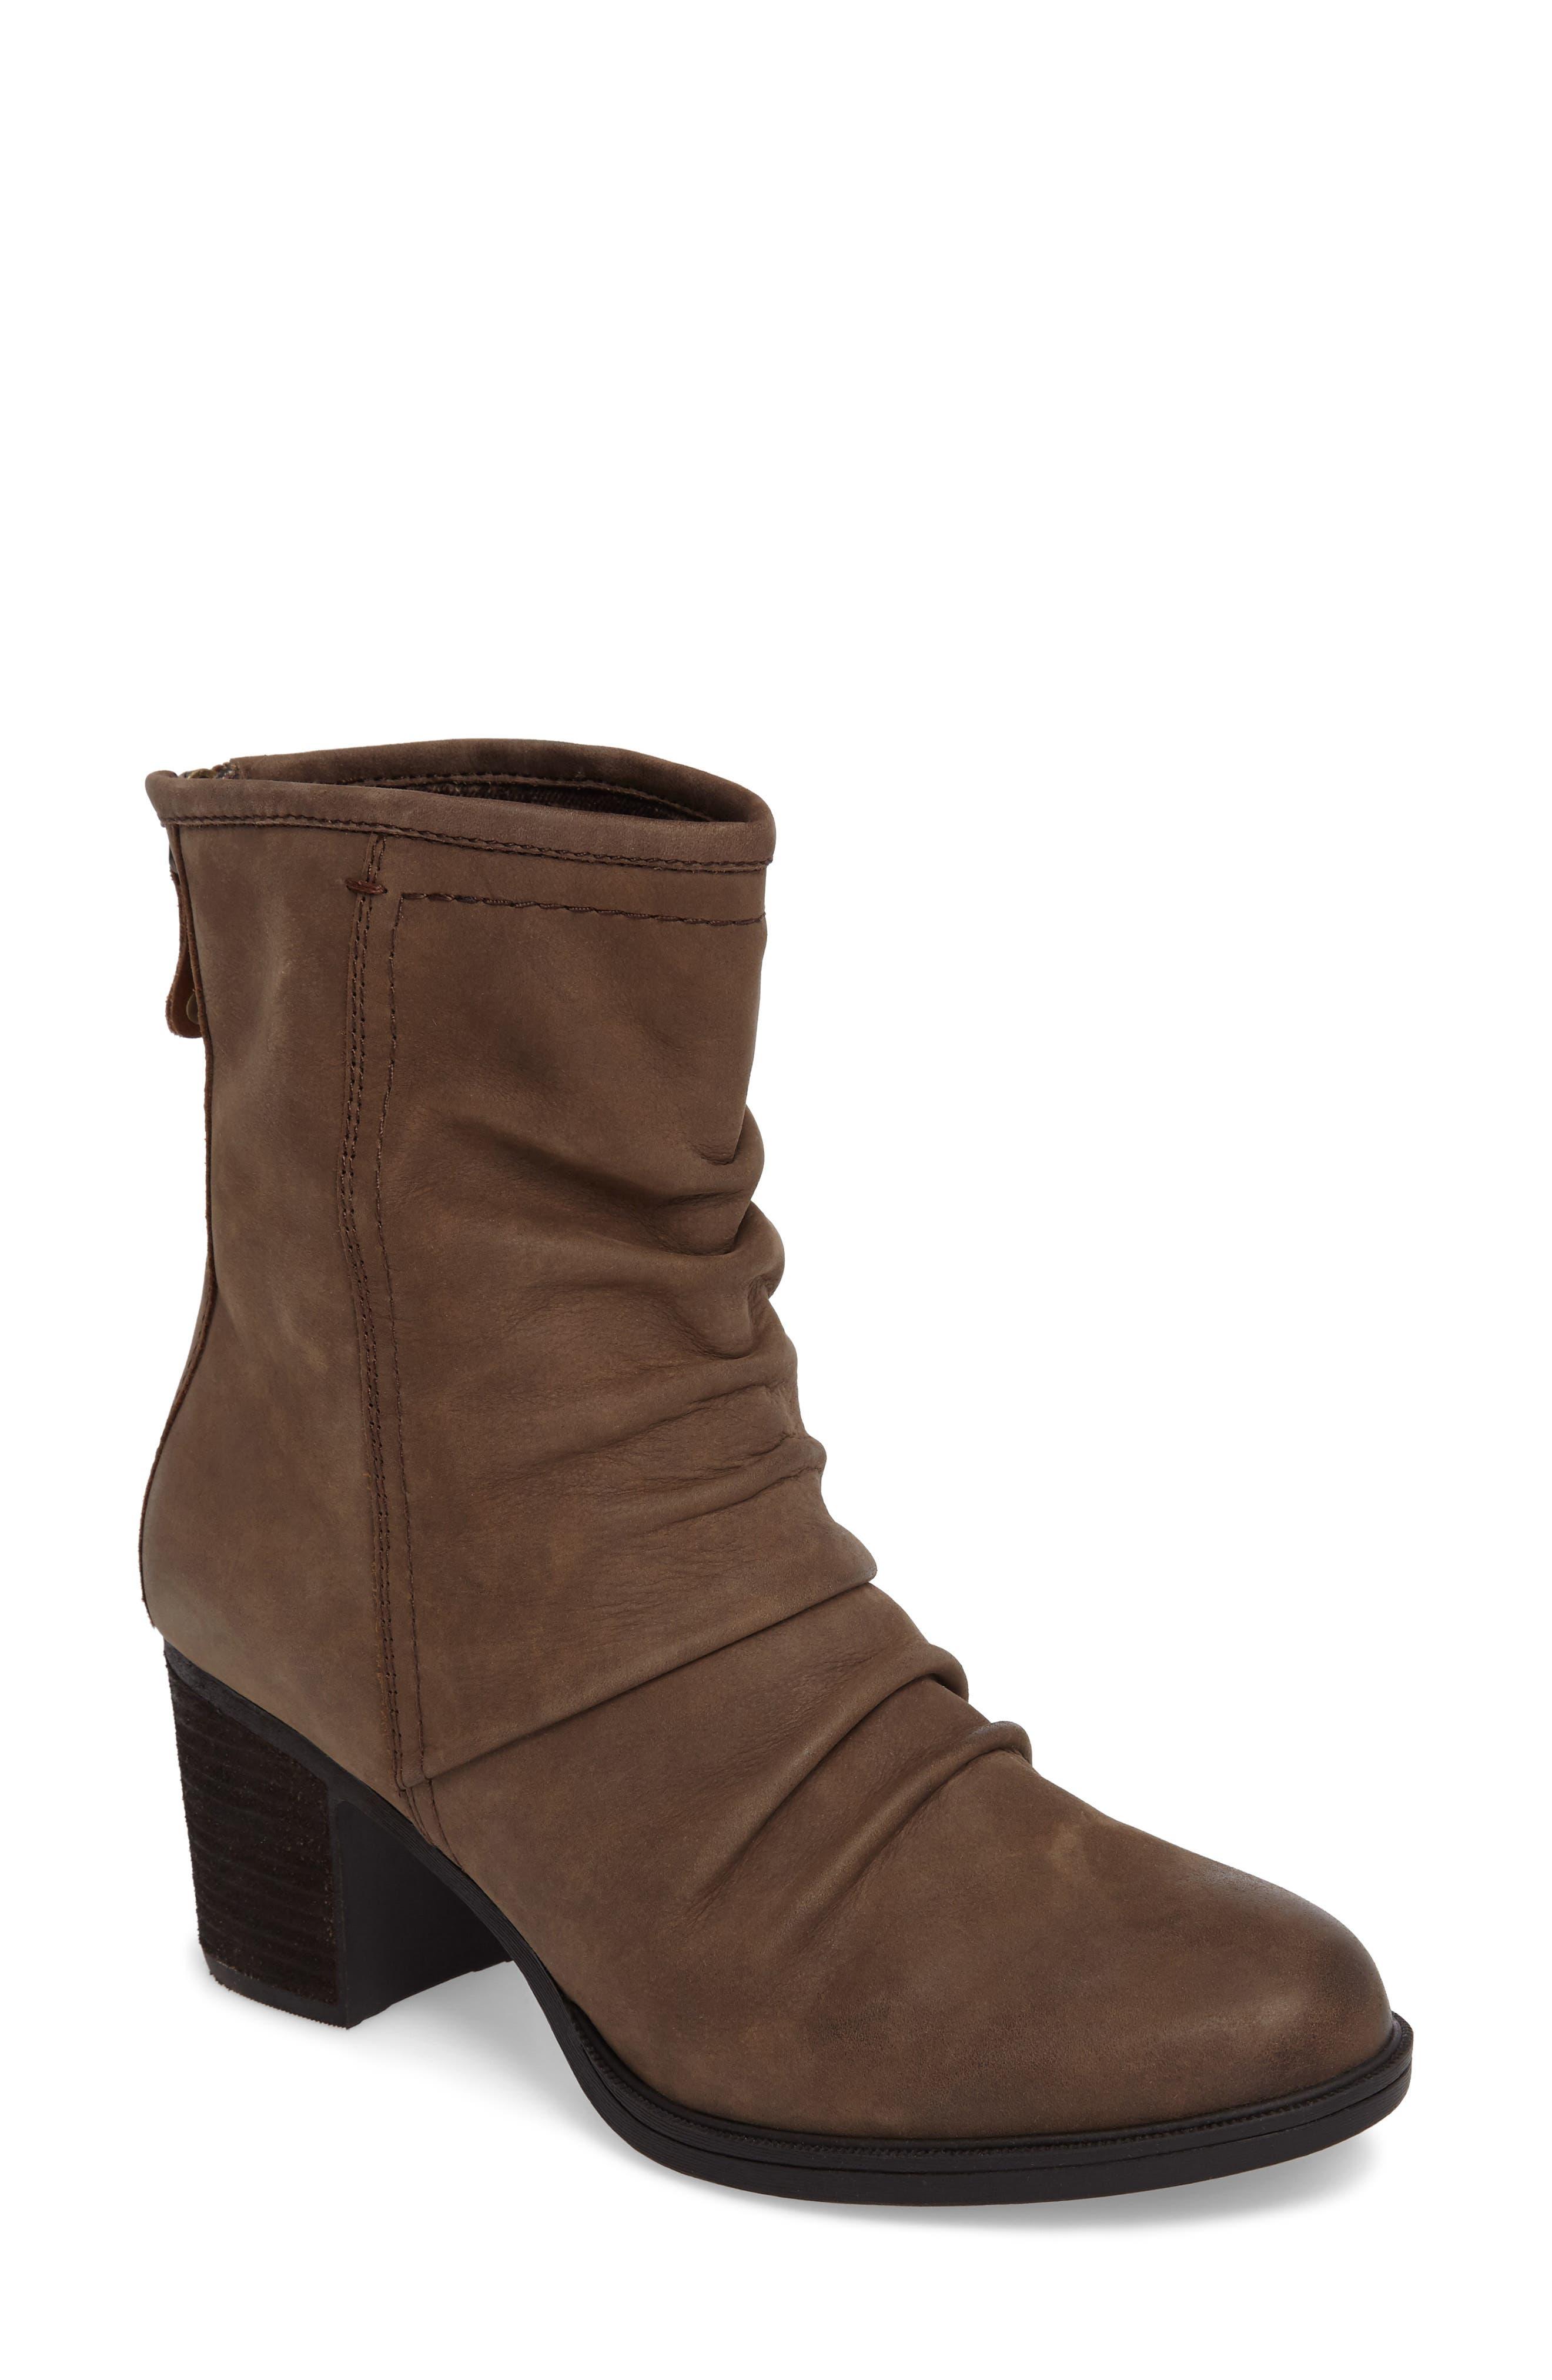 Rockport Cobb Hill Natashya Slouchy Block Heel Bootie (Women)